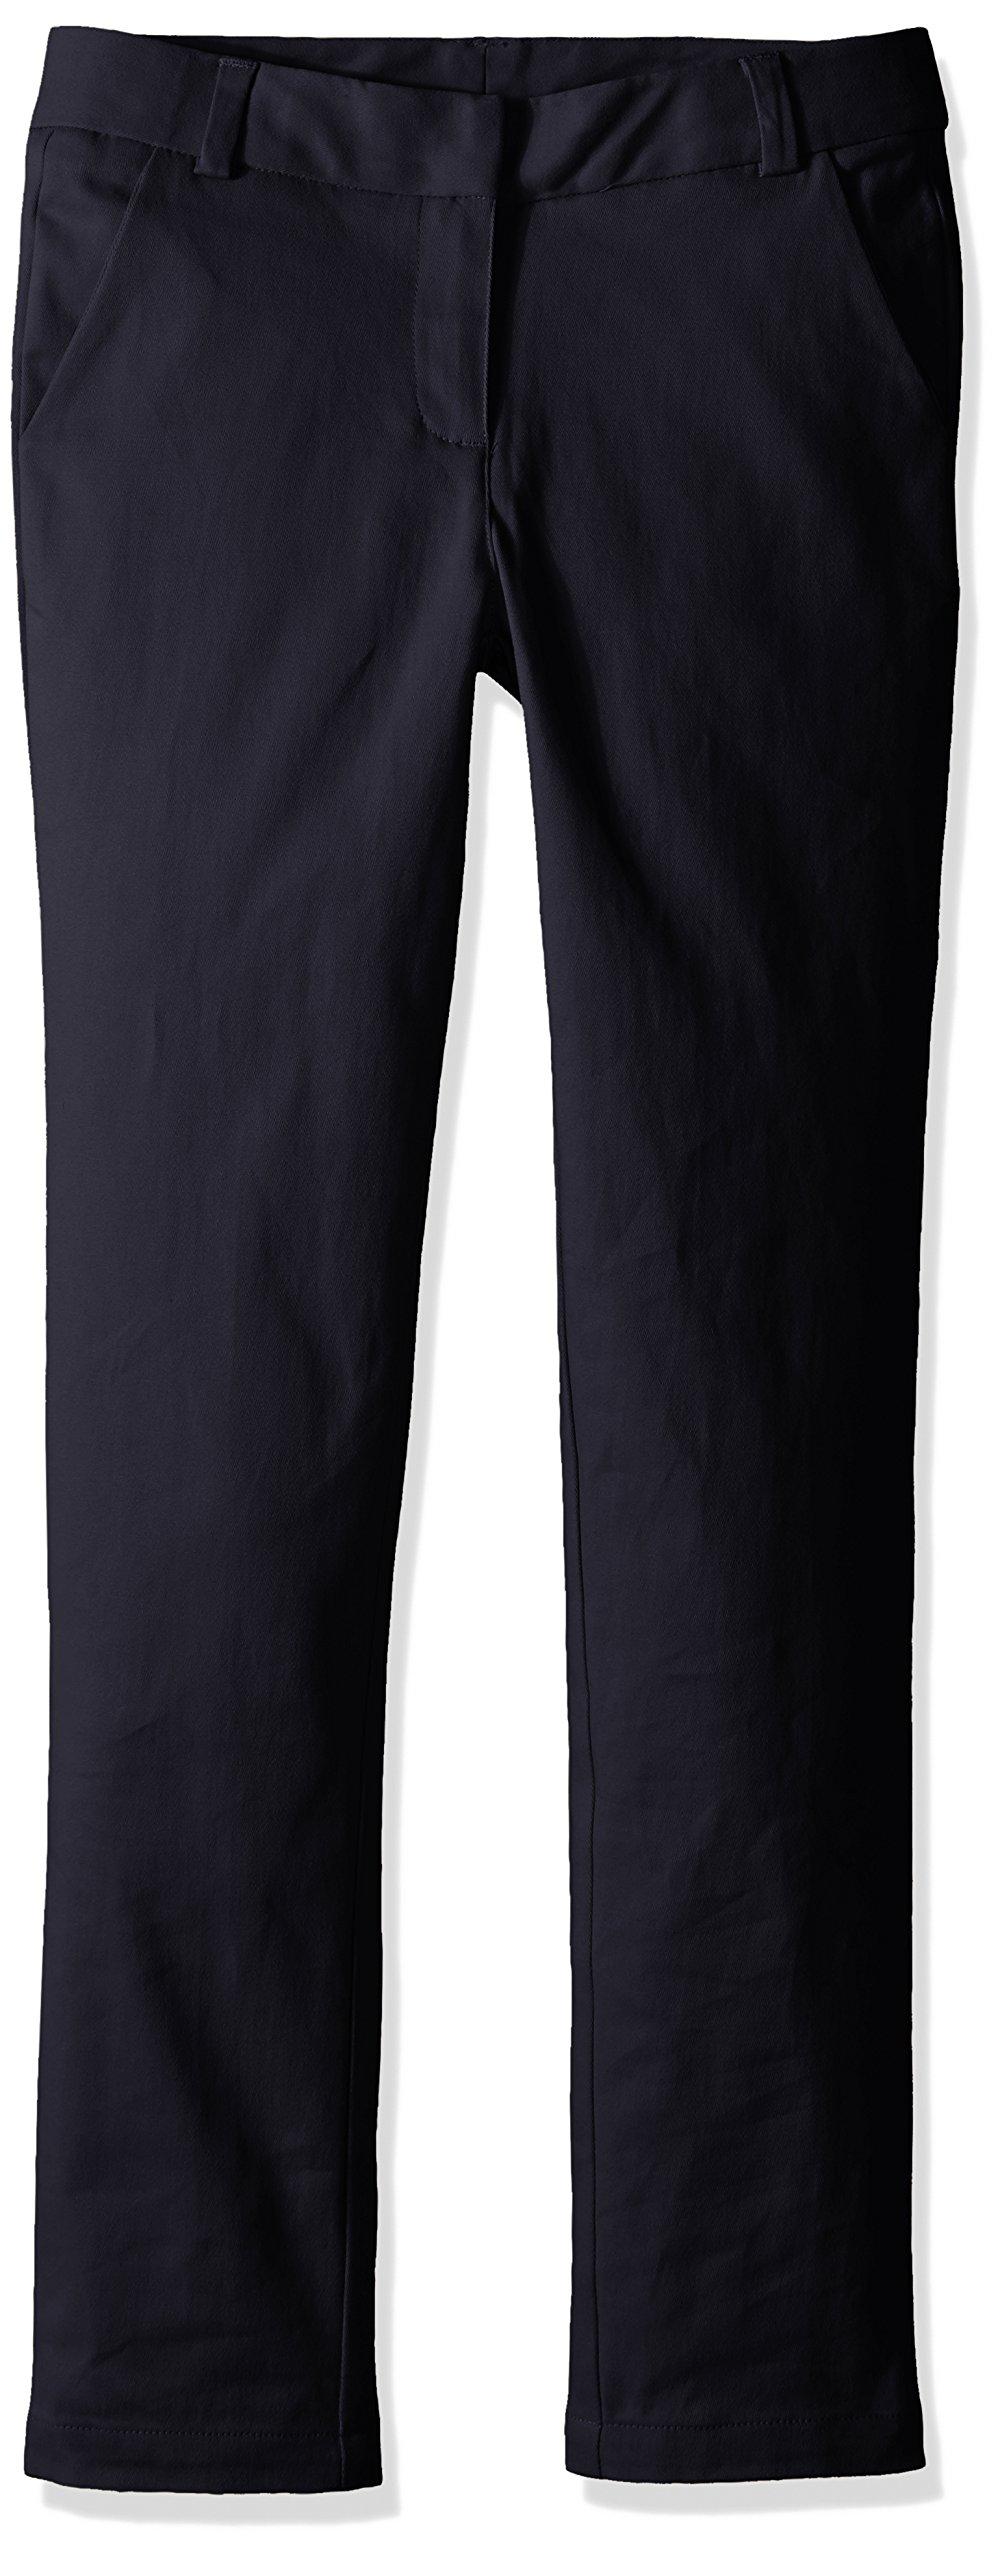 Nautica Big Girls' Uniform Straight Leg Stretch Twill Pants, Navy, 10